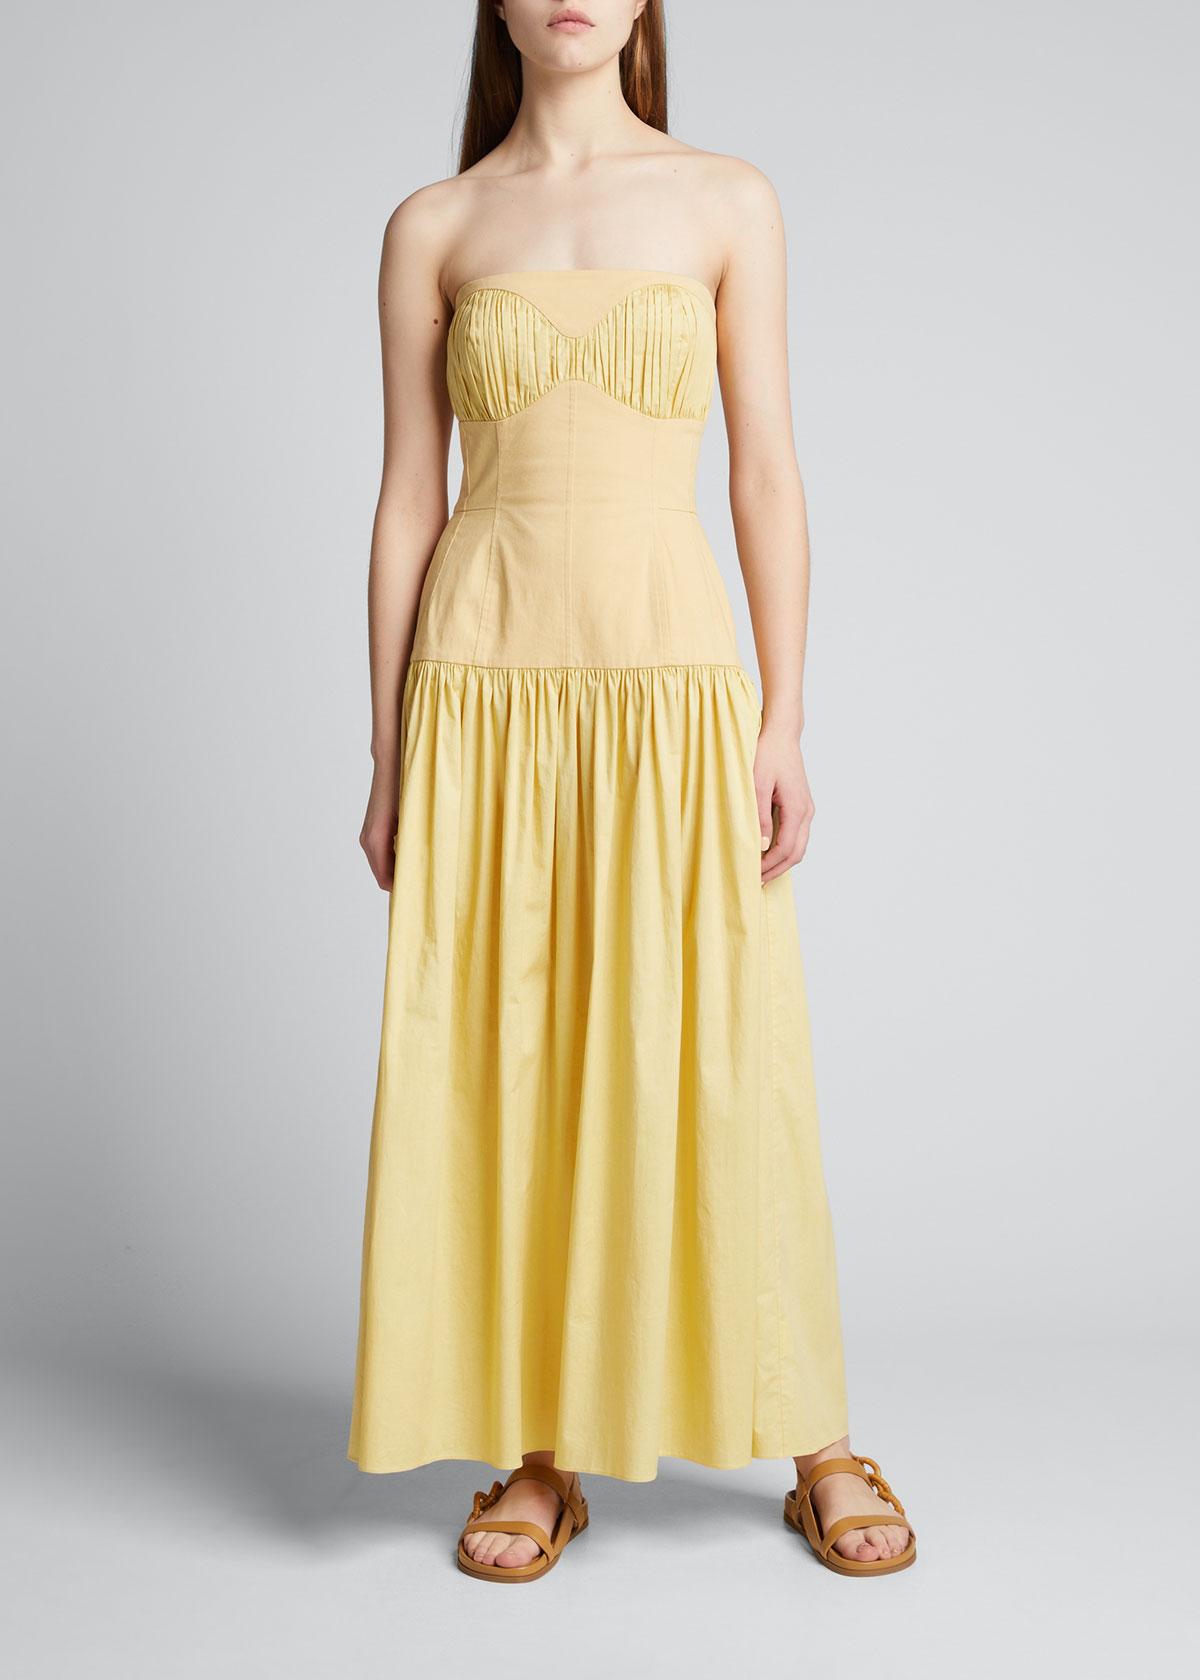 Tove LAURYN SHIRRED STRAPLESS MAXI DRESS